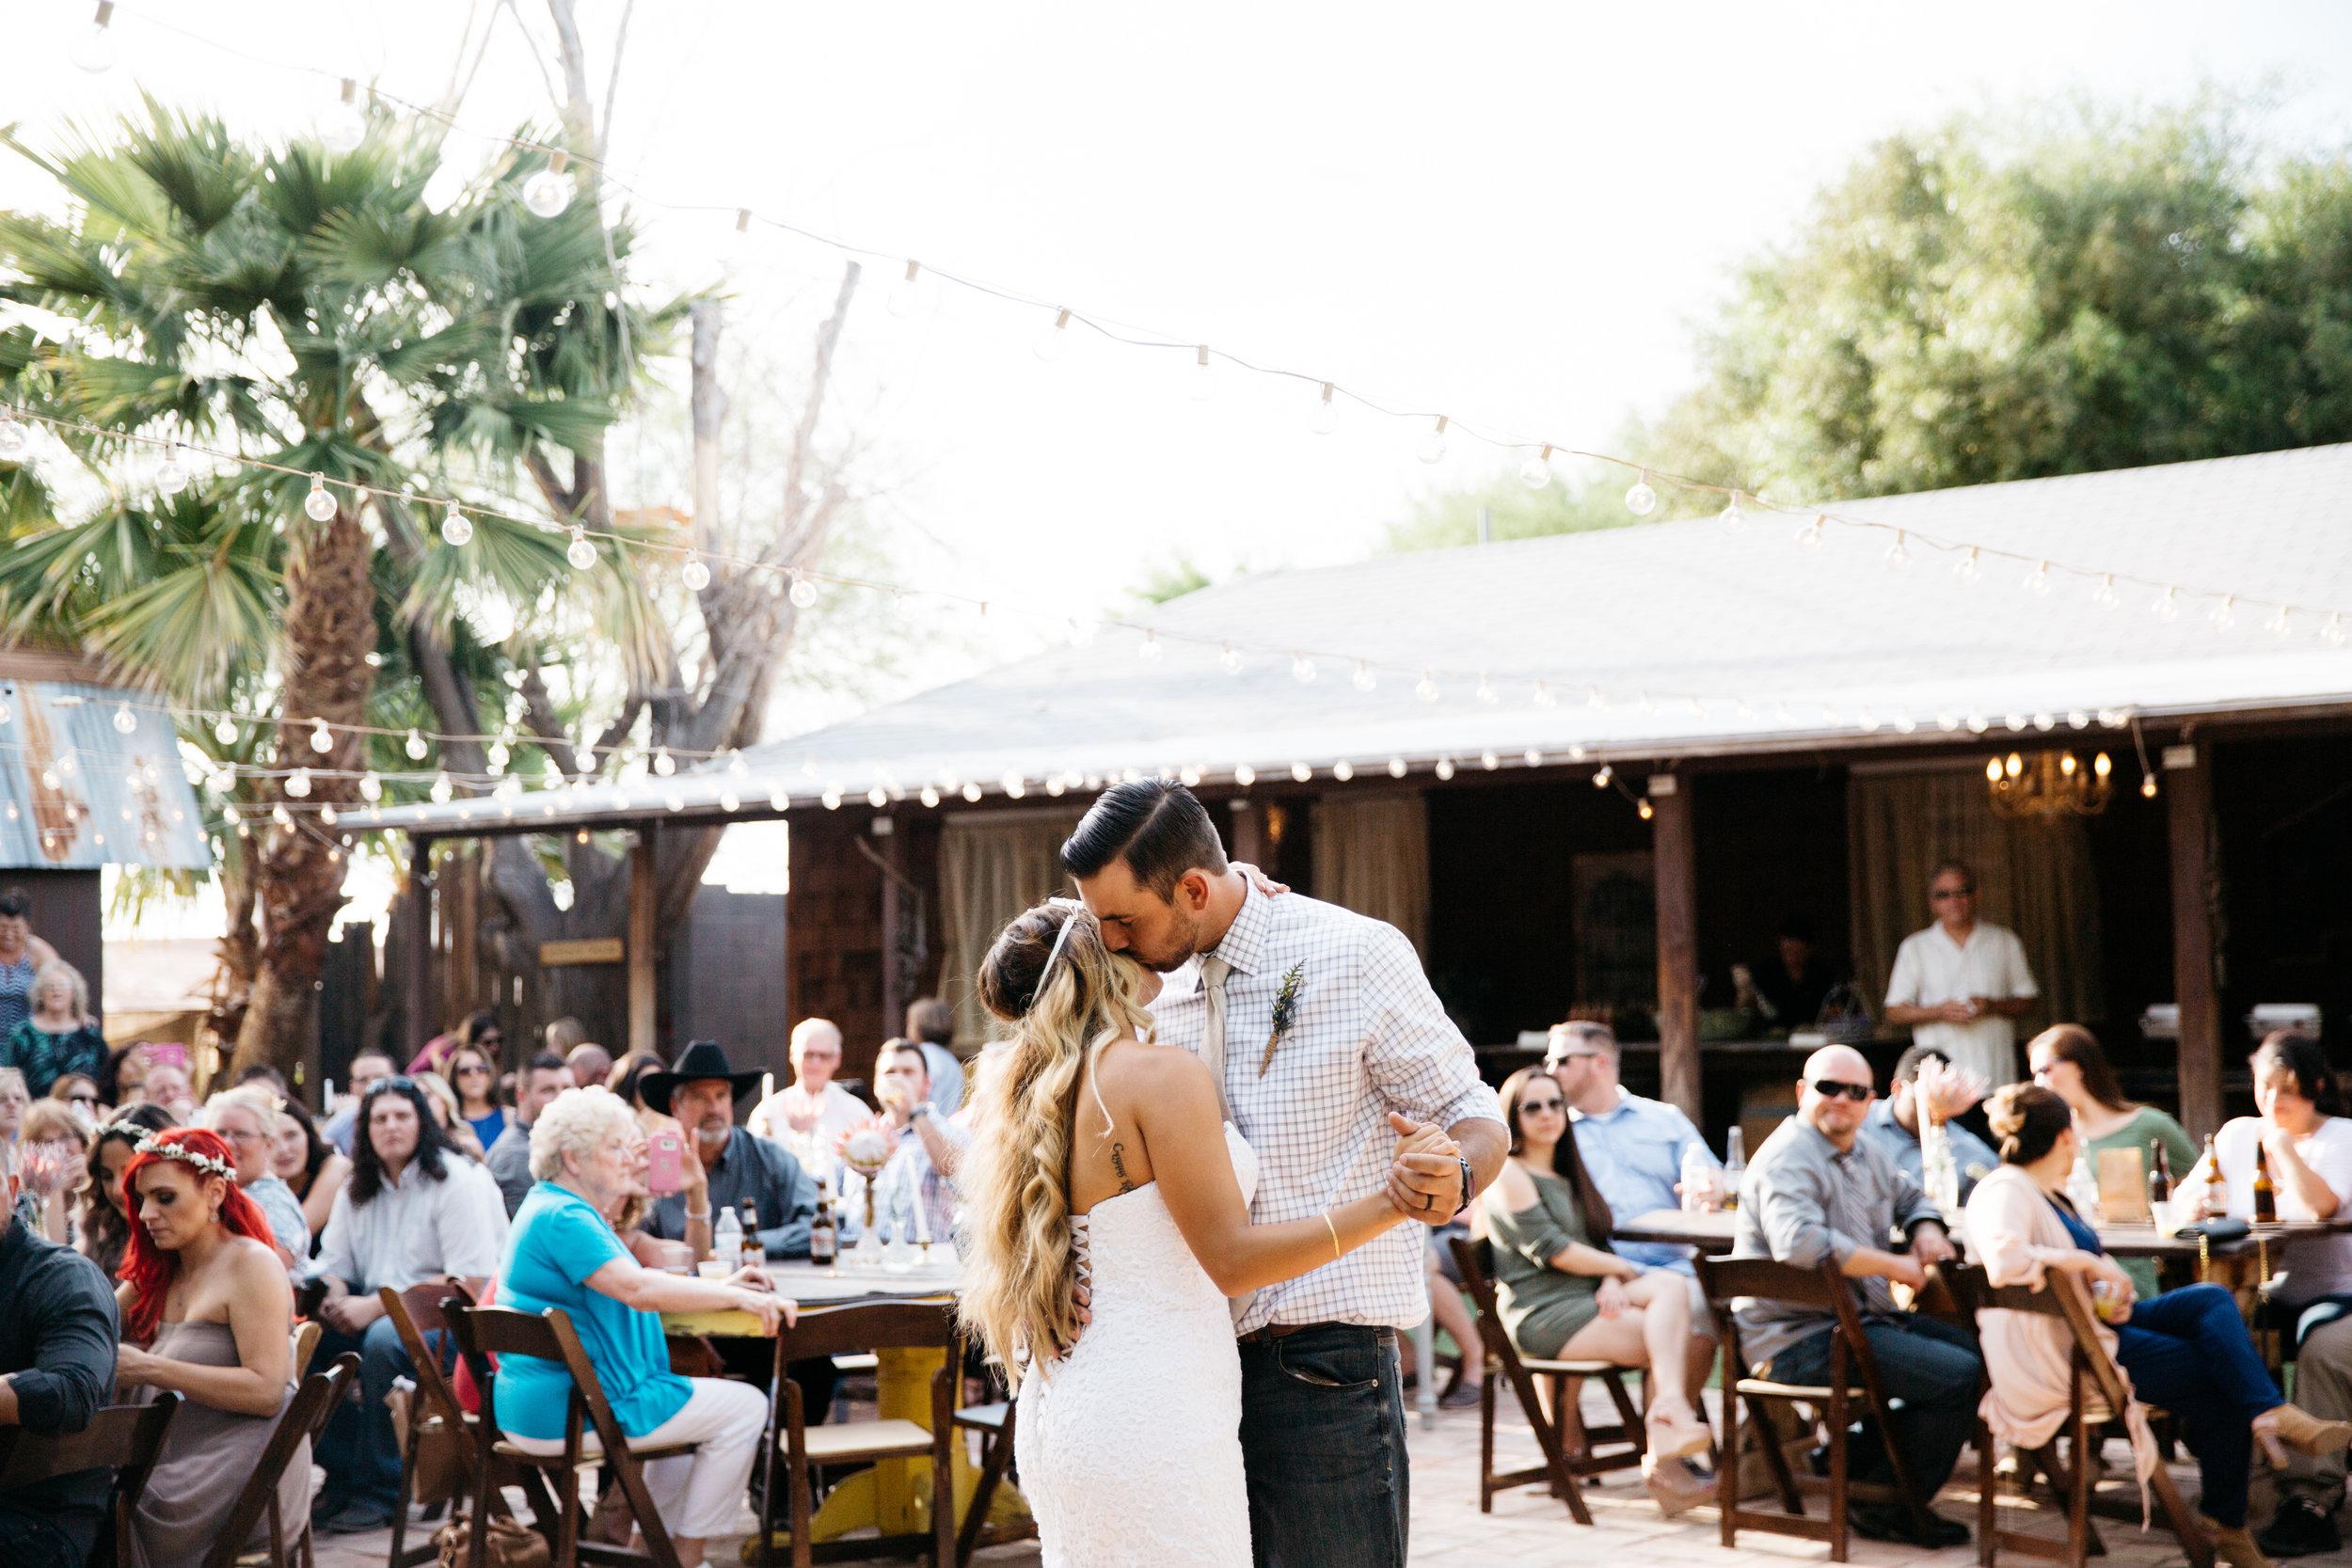 colorado-springs-wedding-photographer-41.jpg